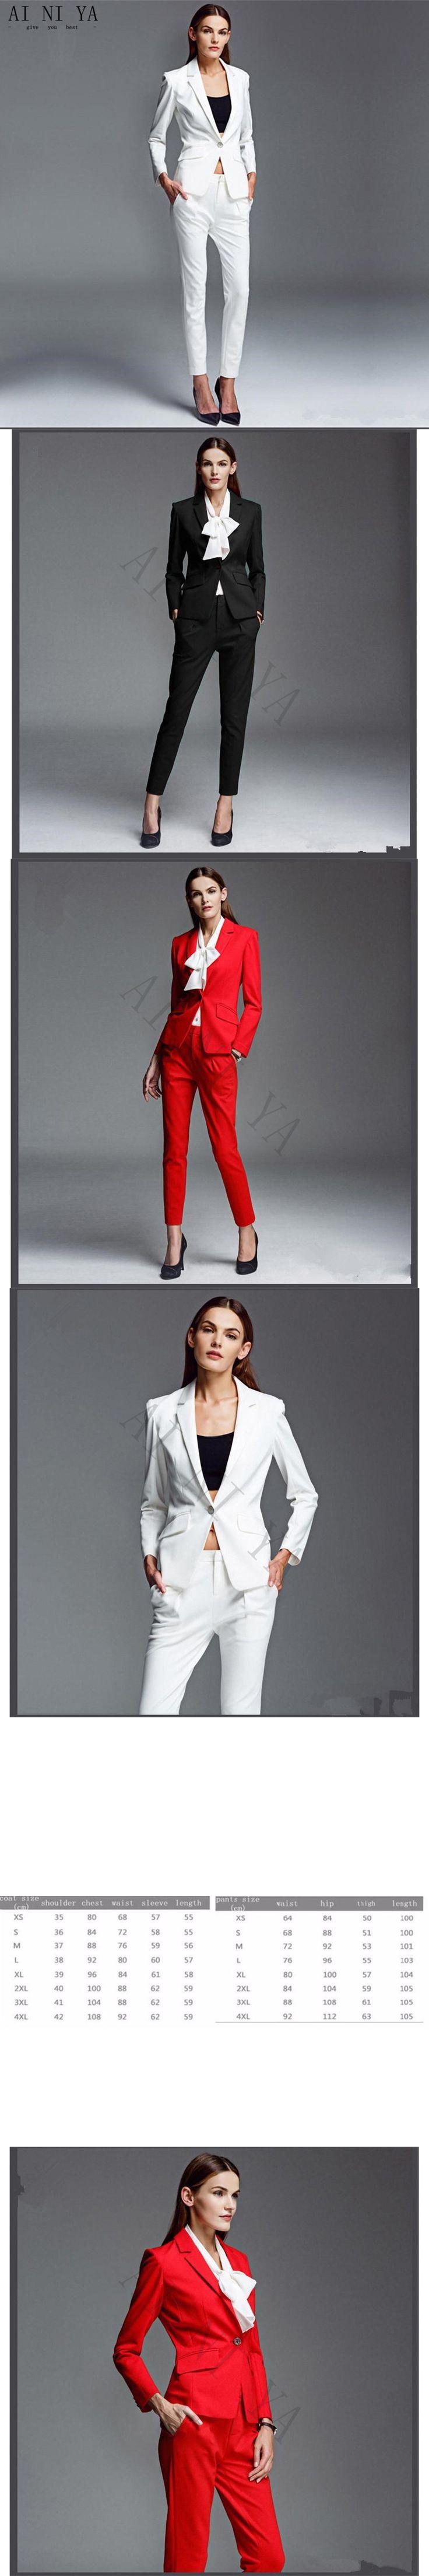 Female Busines s Elegant Pant Suits OL Formal Work Wear Blazer Women Trouser Suit Ladies Office Uniform 2 Piece Set Custom